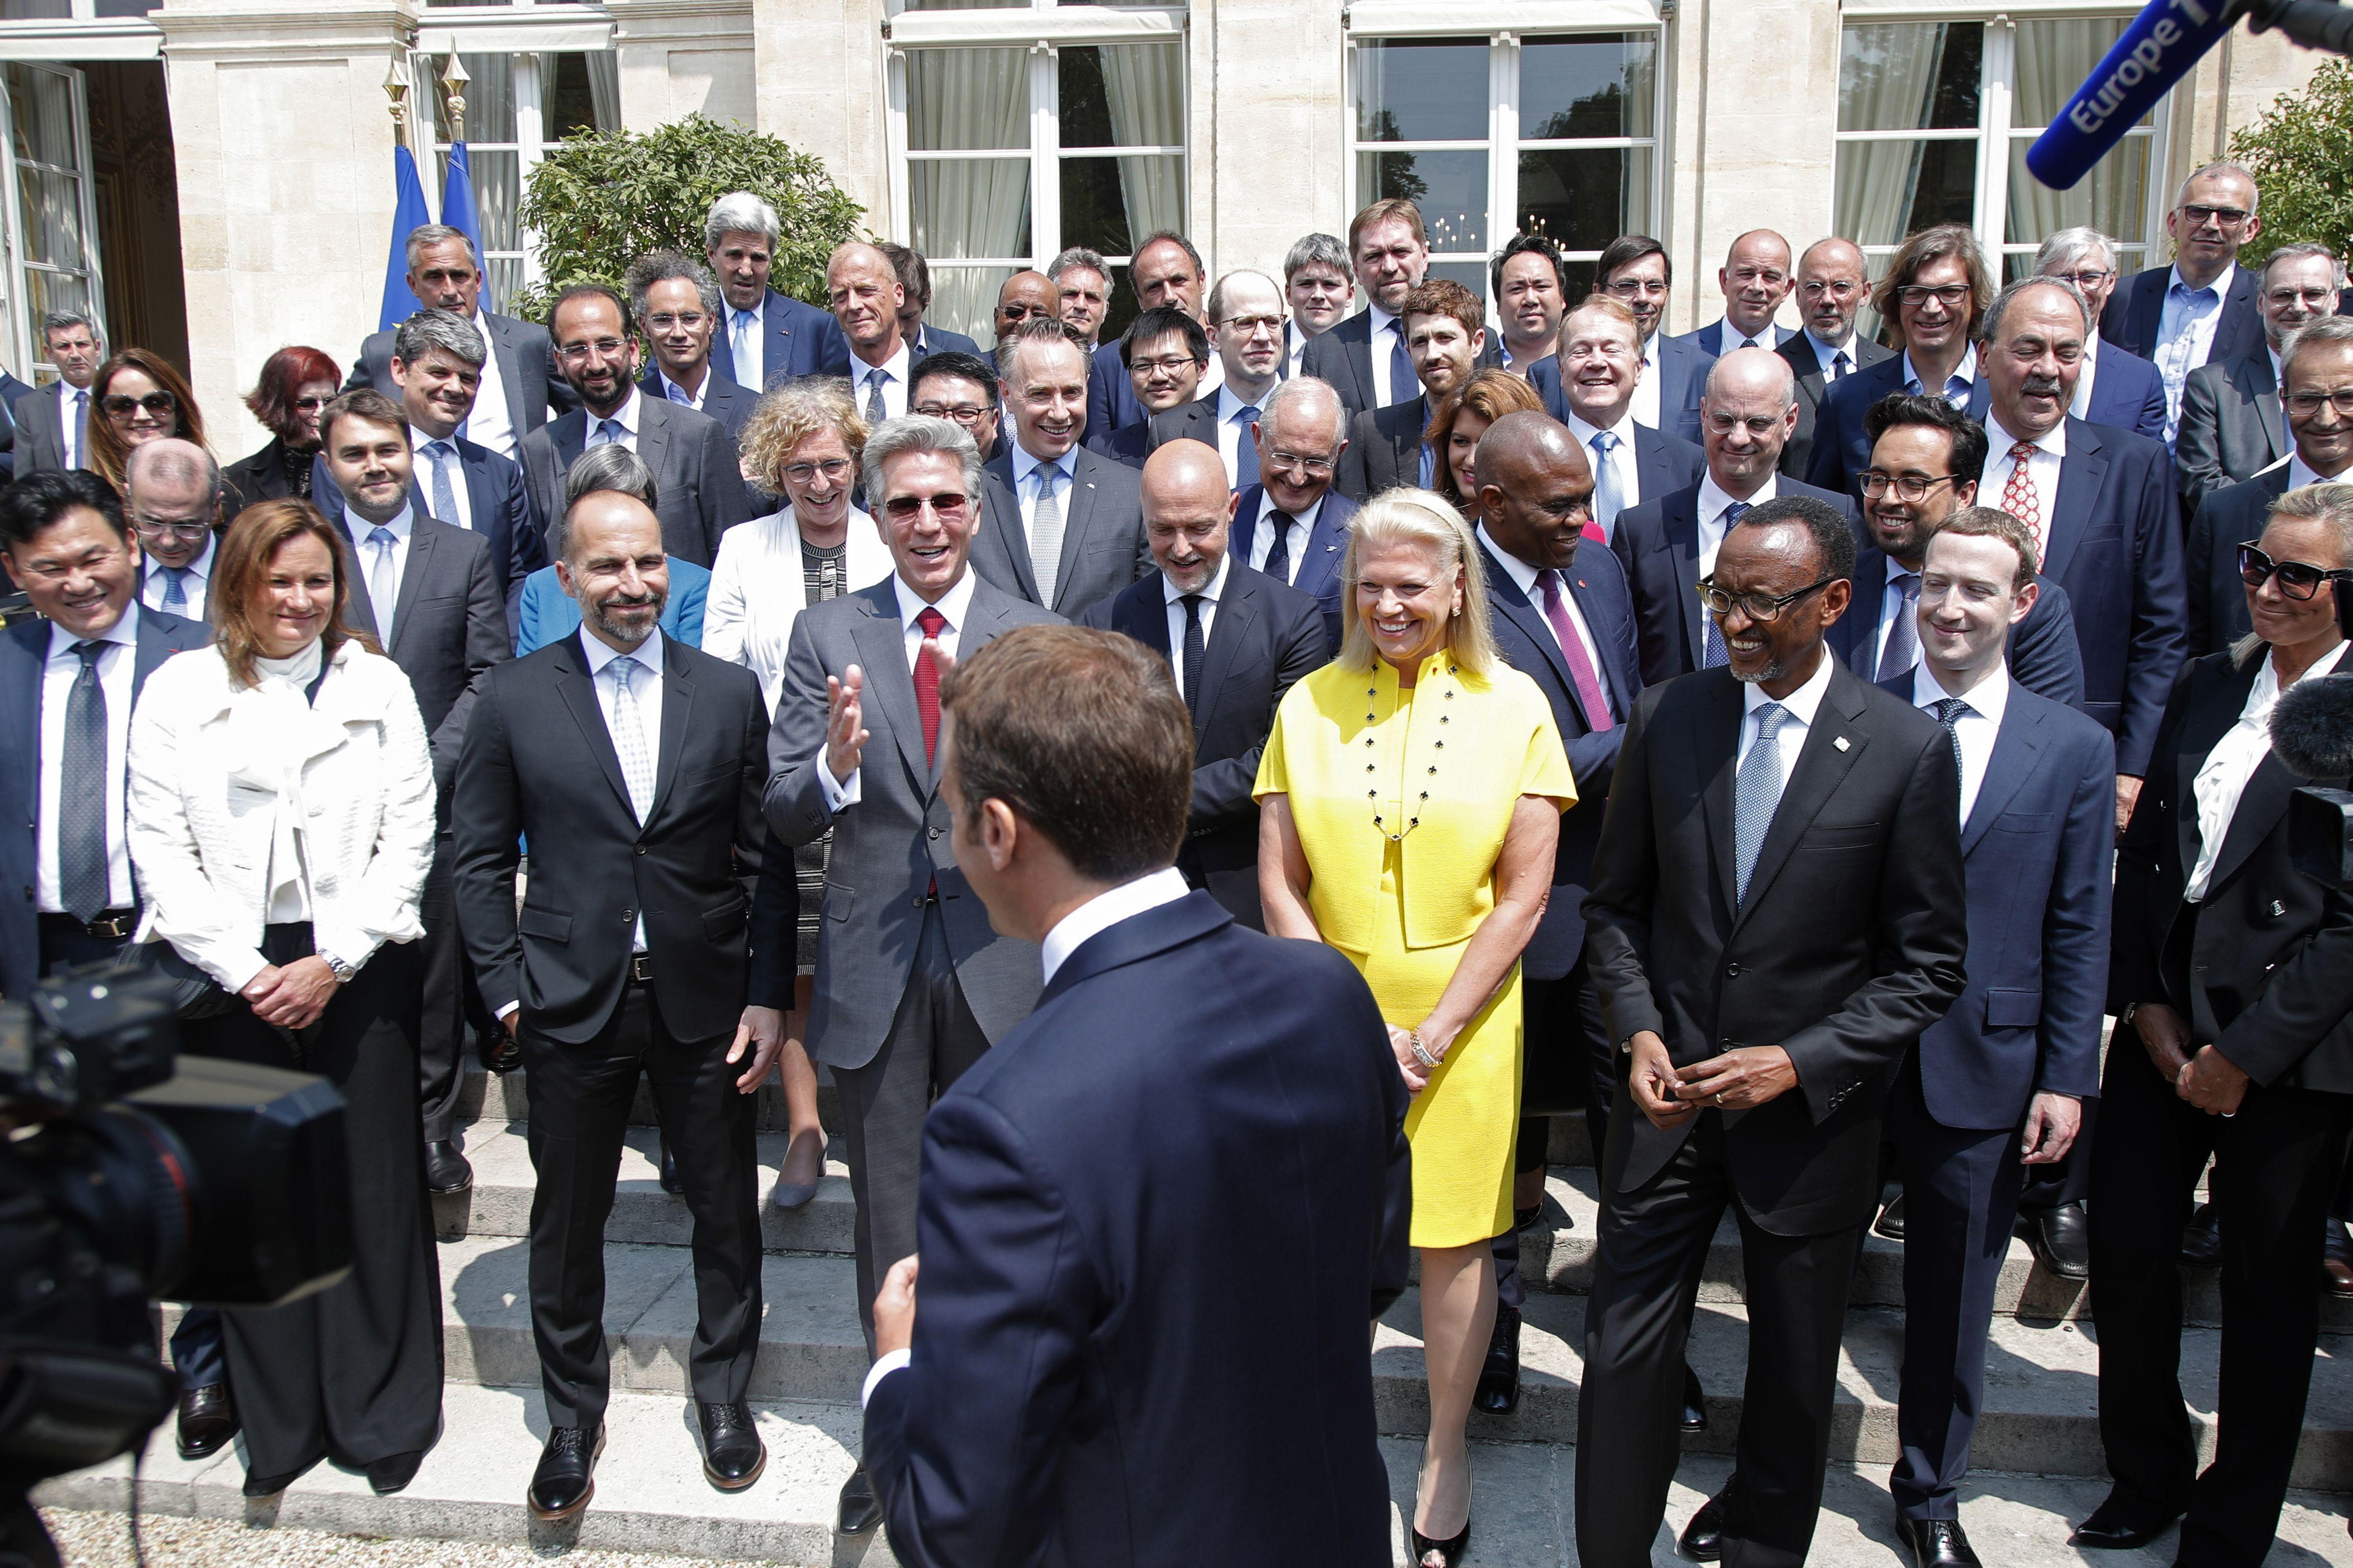 FRANCE-TECHNOLOGY-POLITICS-GOVERNMENT-ECONOMY